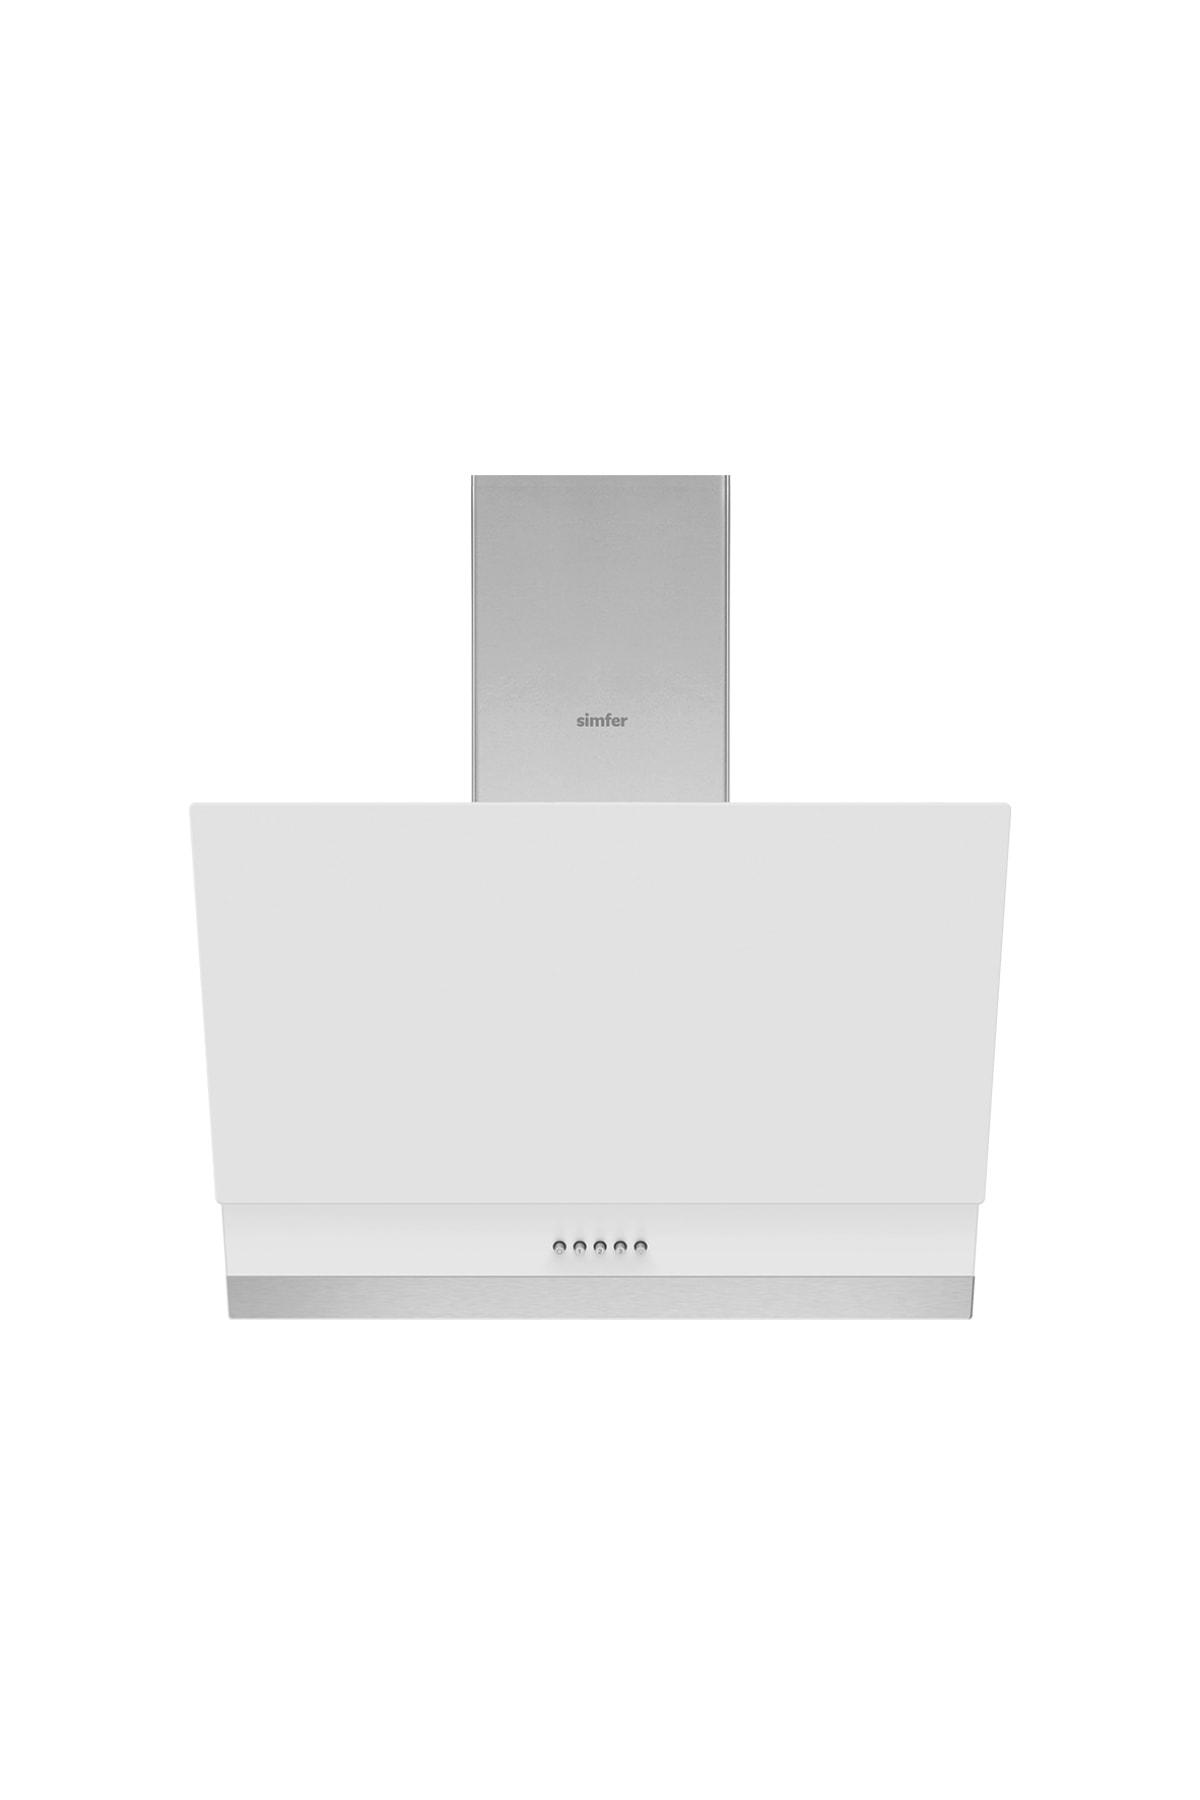 Simfer Beyaz Dijital Ankastre Cam Set (3507 - 9604 - 7340) 2